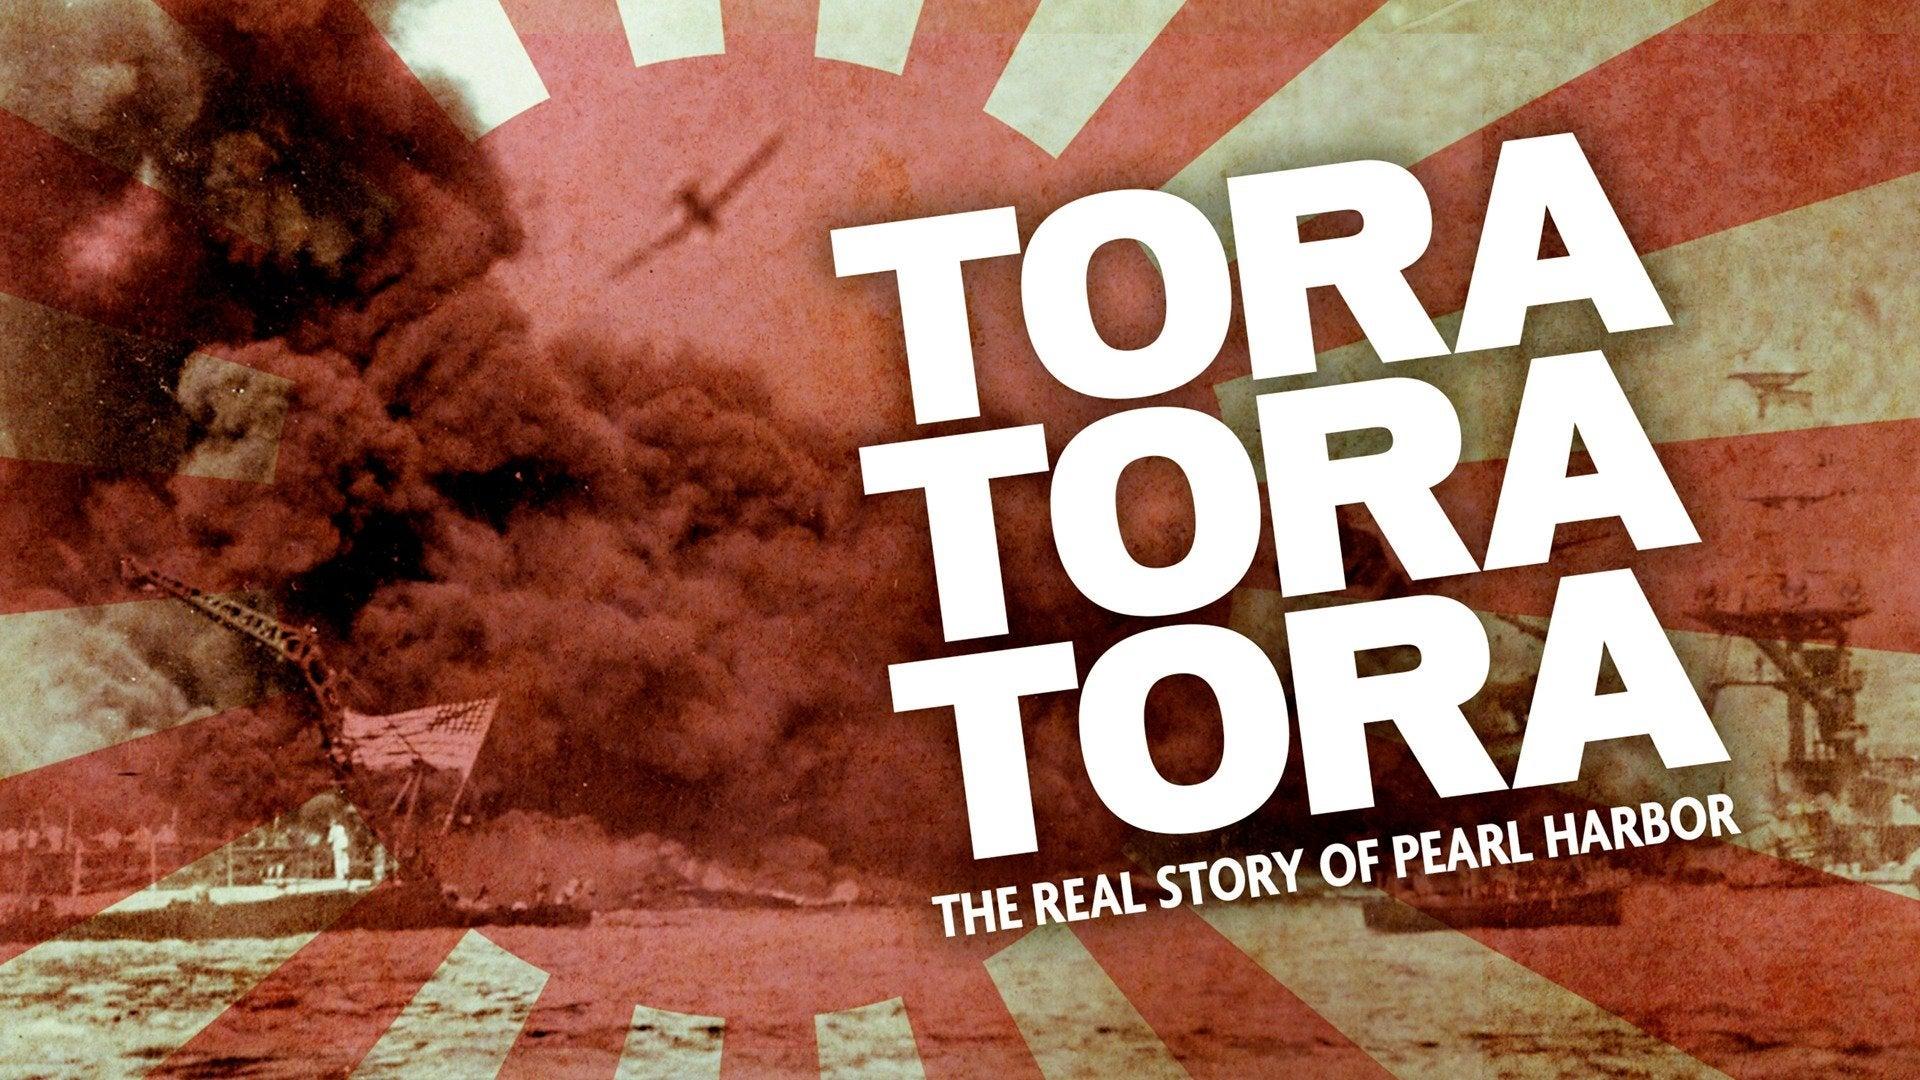 Tora, Tora, Tora: The Real Story of Pearl Harbor